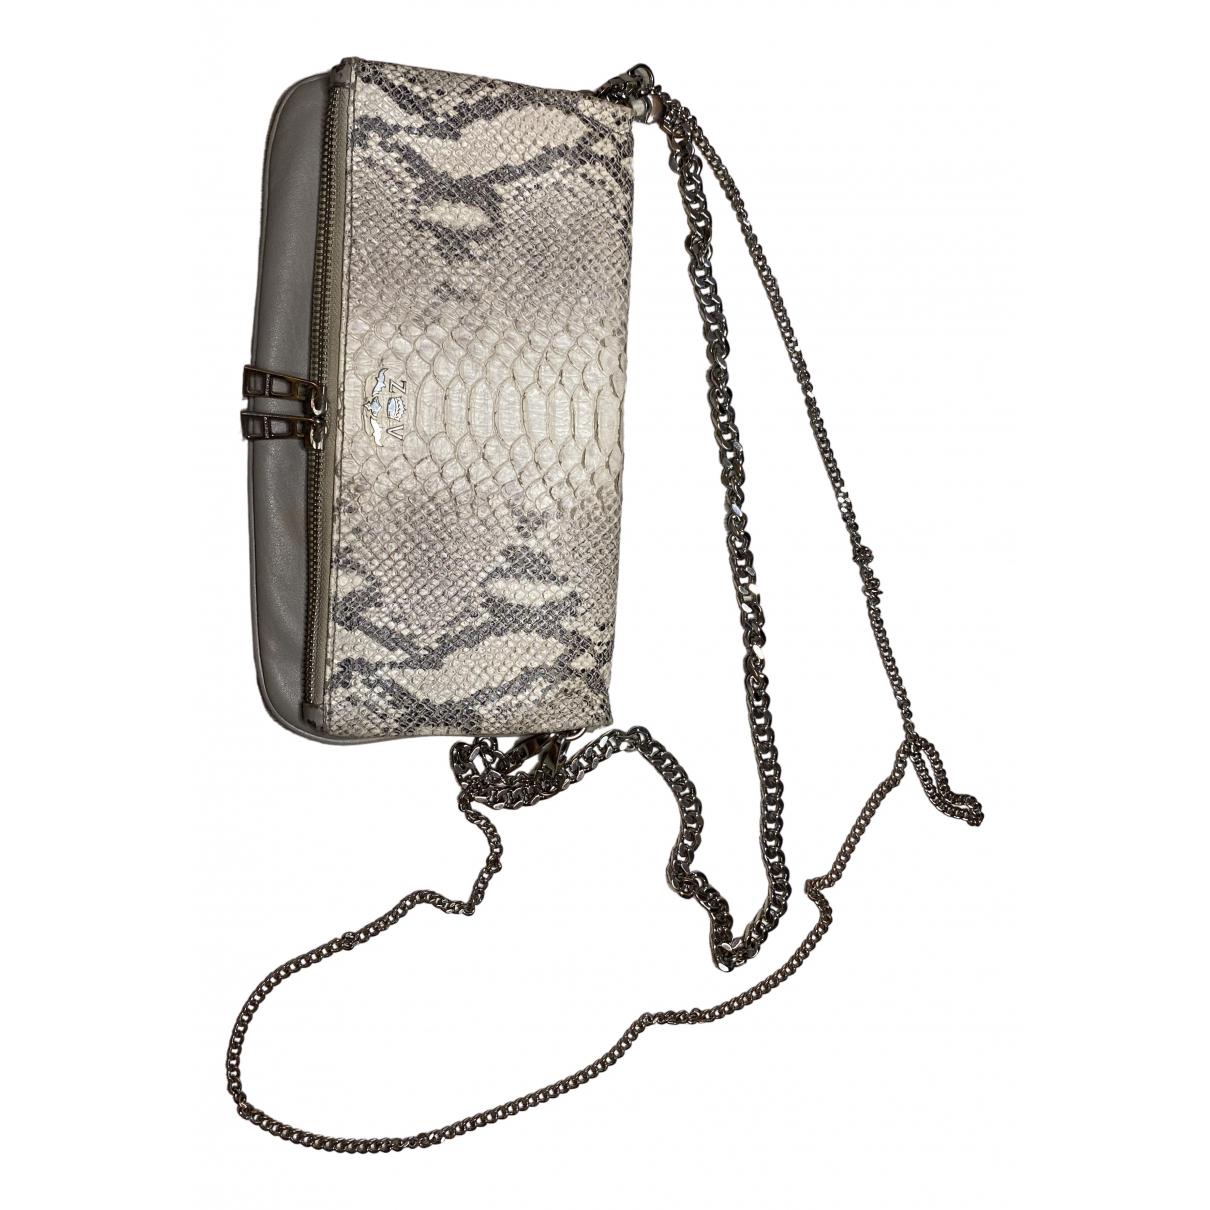 Zadig & Voltaire \N Ecru Leather handbag for Women \N